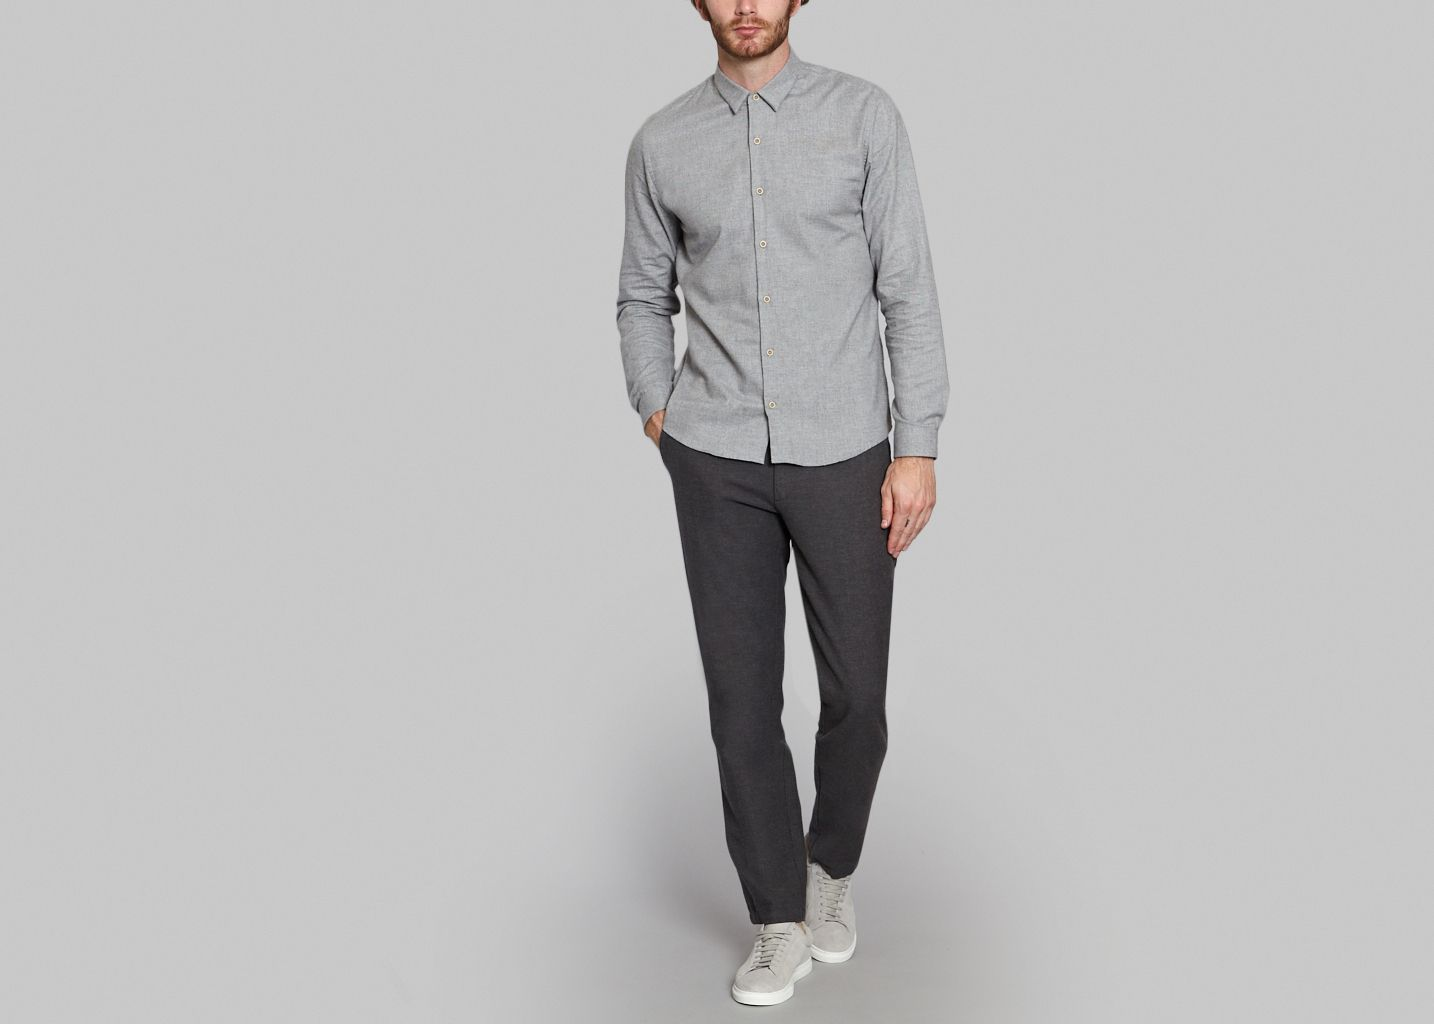 Mottled Shirt - JagVi